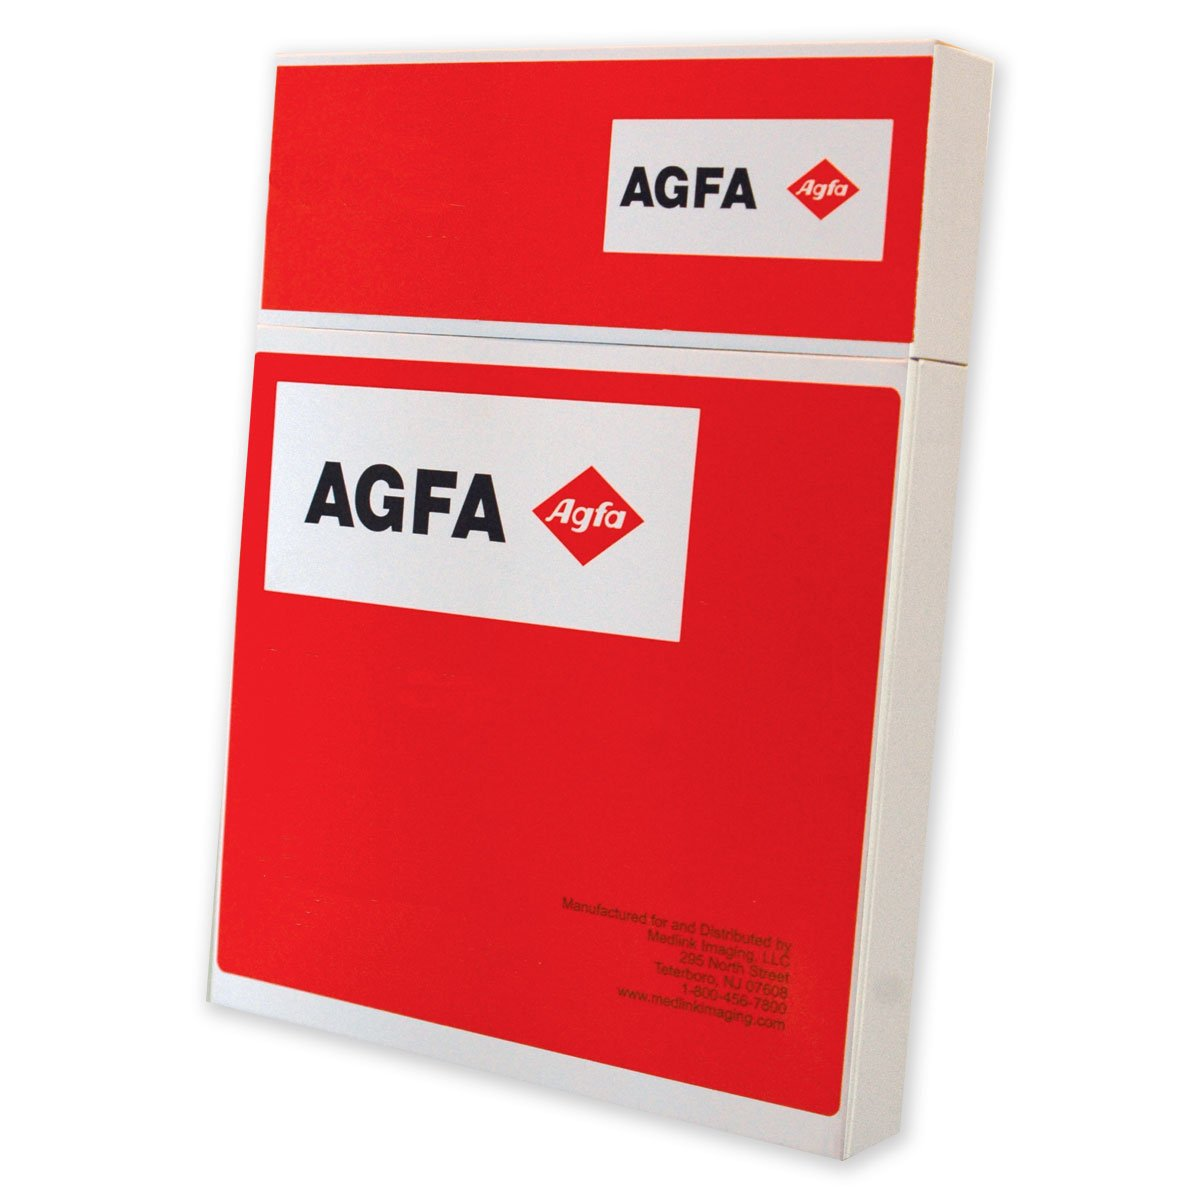 Image of AGFA RADIOMAT PCB2430 X-Ray Film, Full Speed, 24 cm x 30 cm, Blue Sensitive (Pack of 100) X-Ray Film